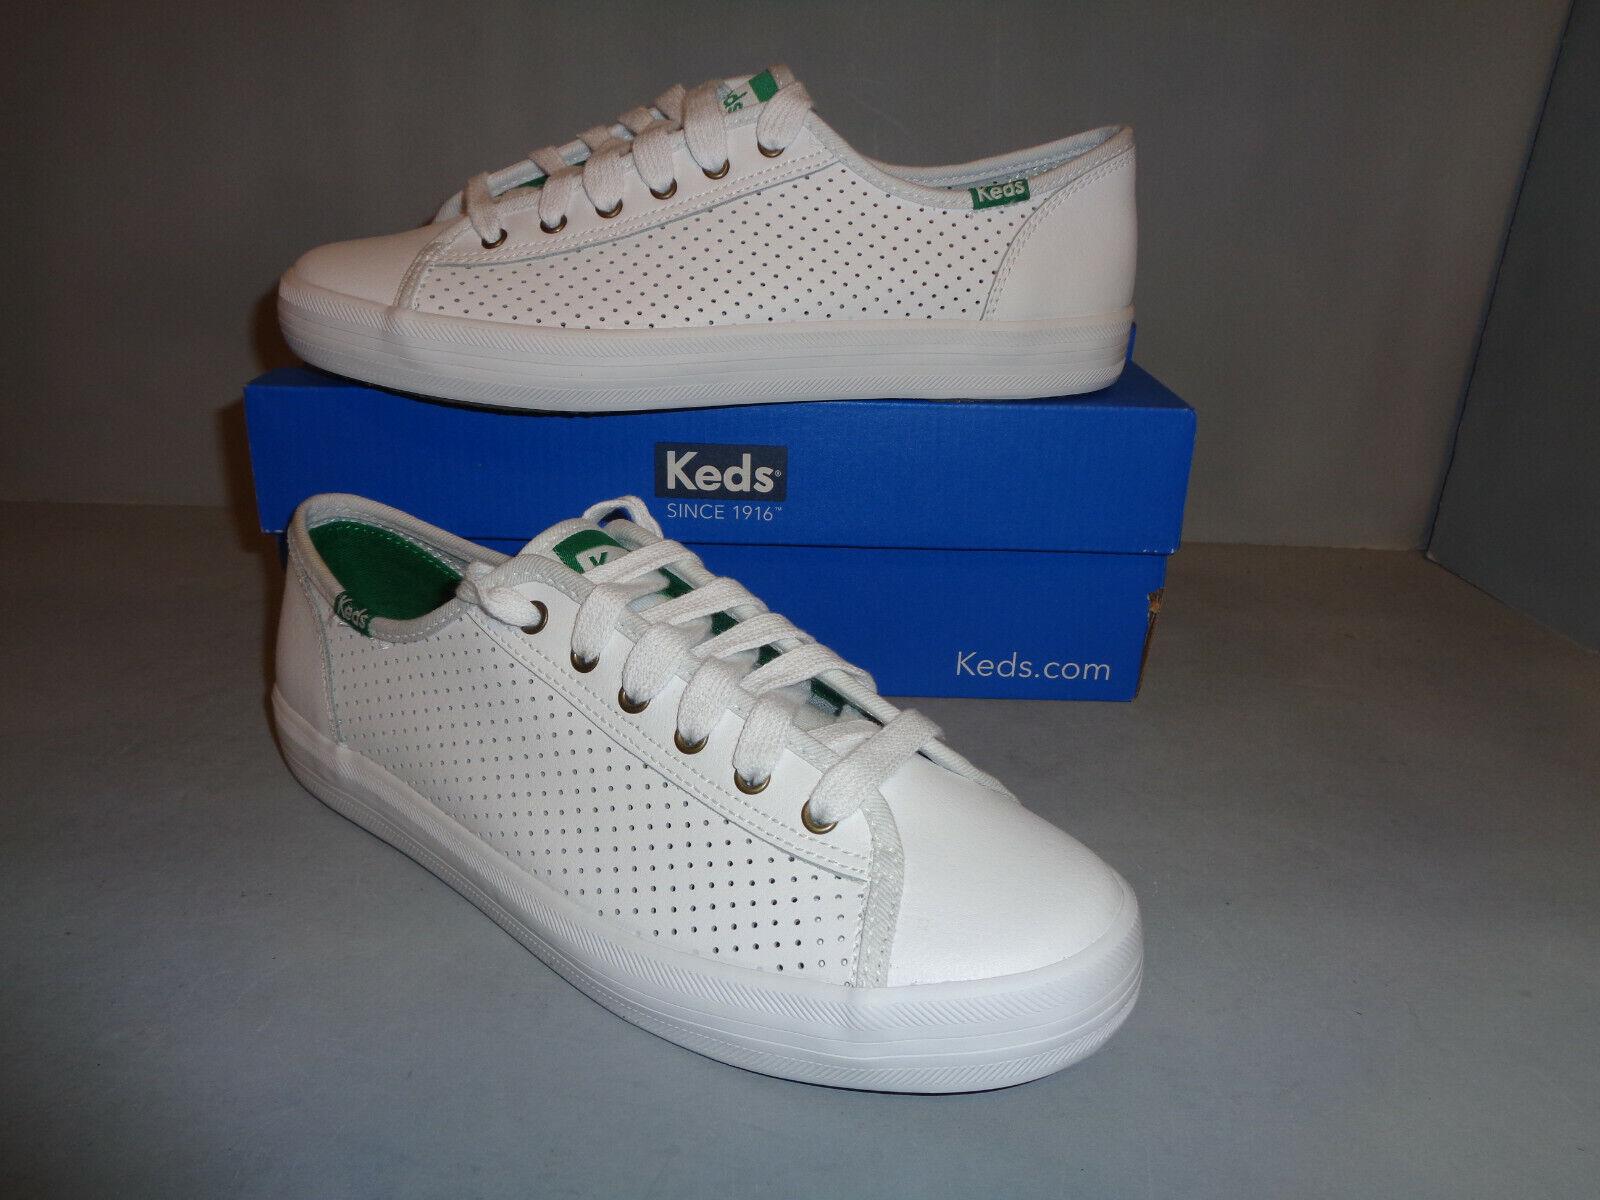 keds kickstart leather perforated